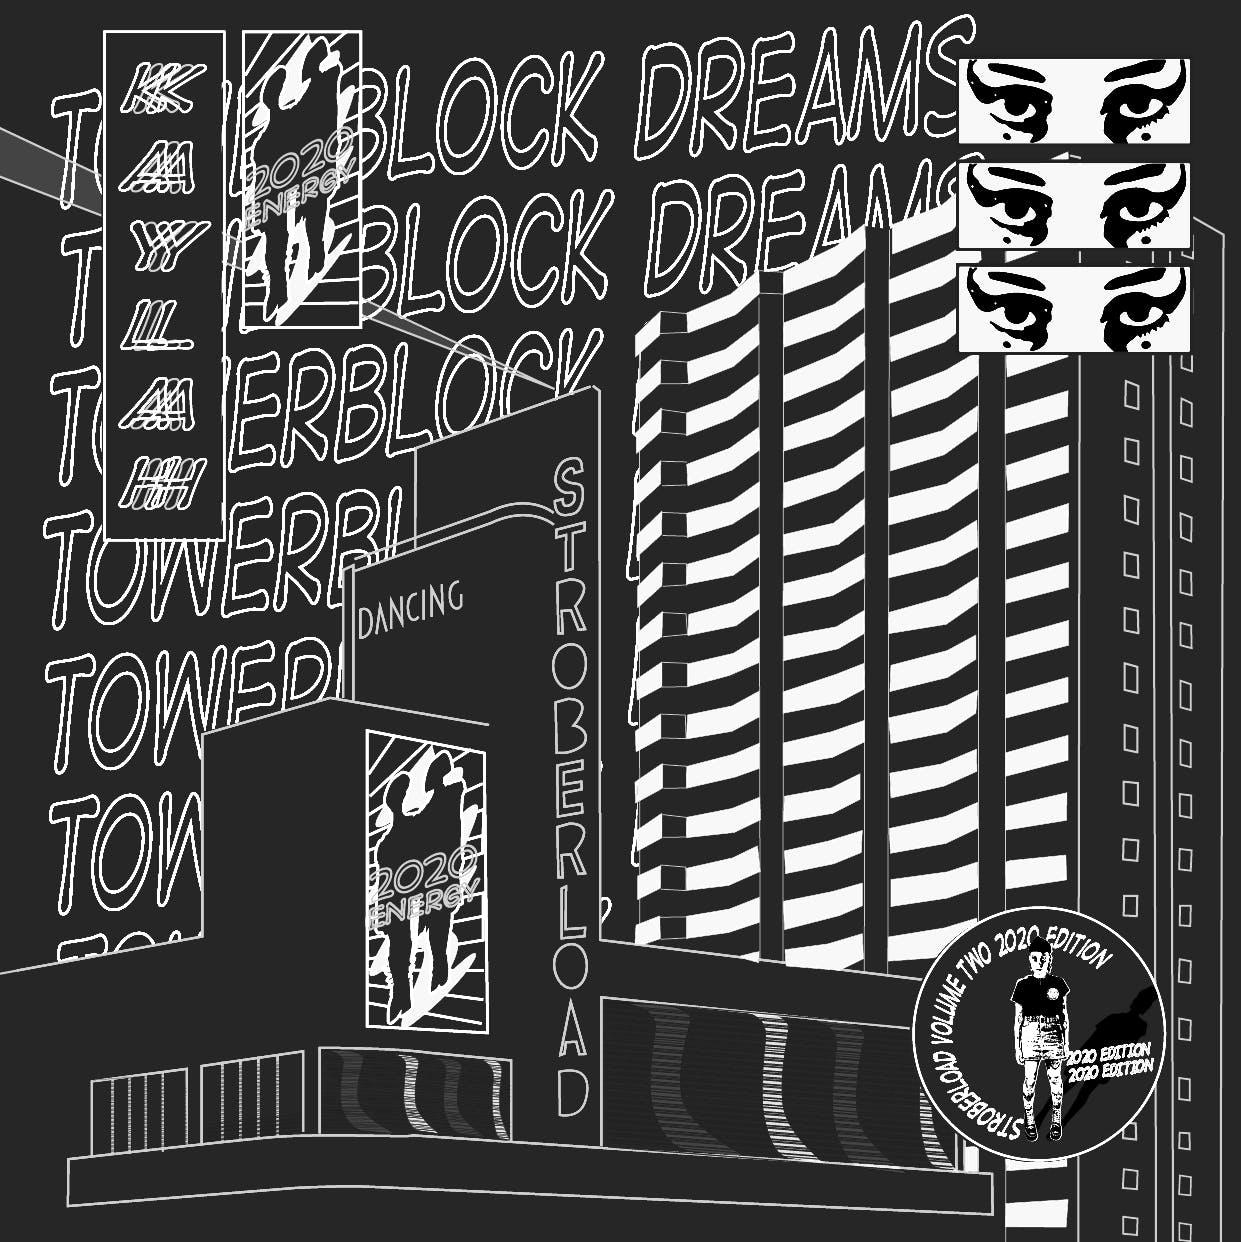 STROBERLOAD: Kaylah's Towerblock Dreams Mix